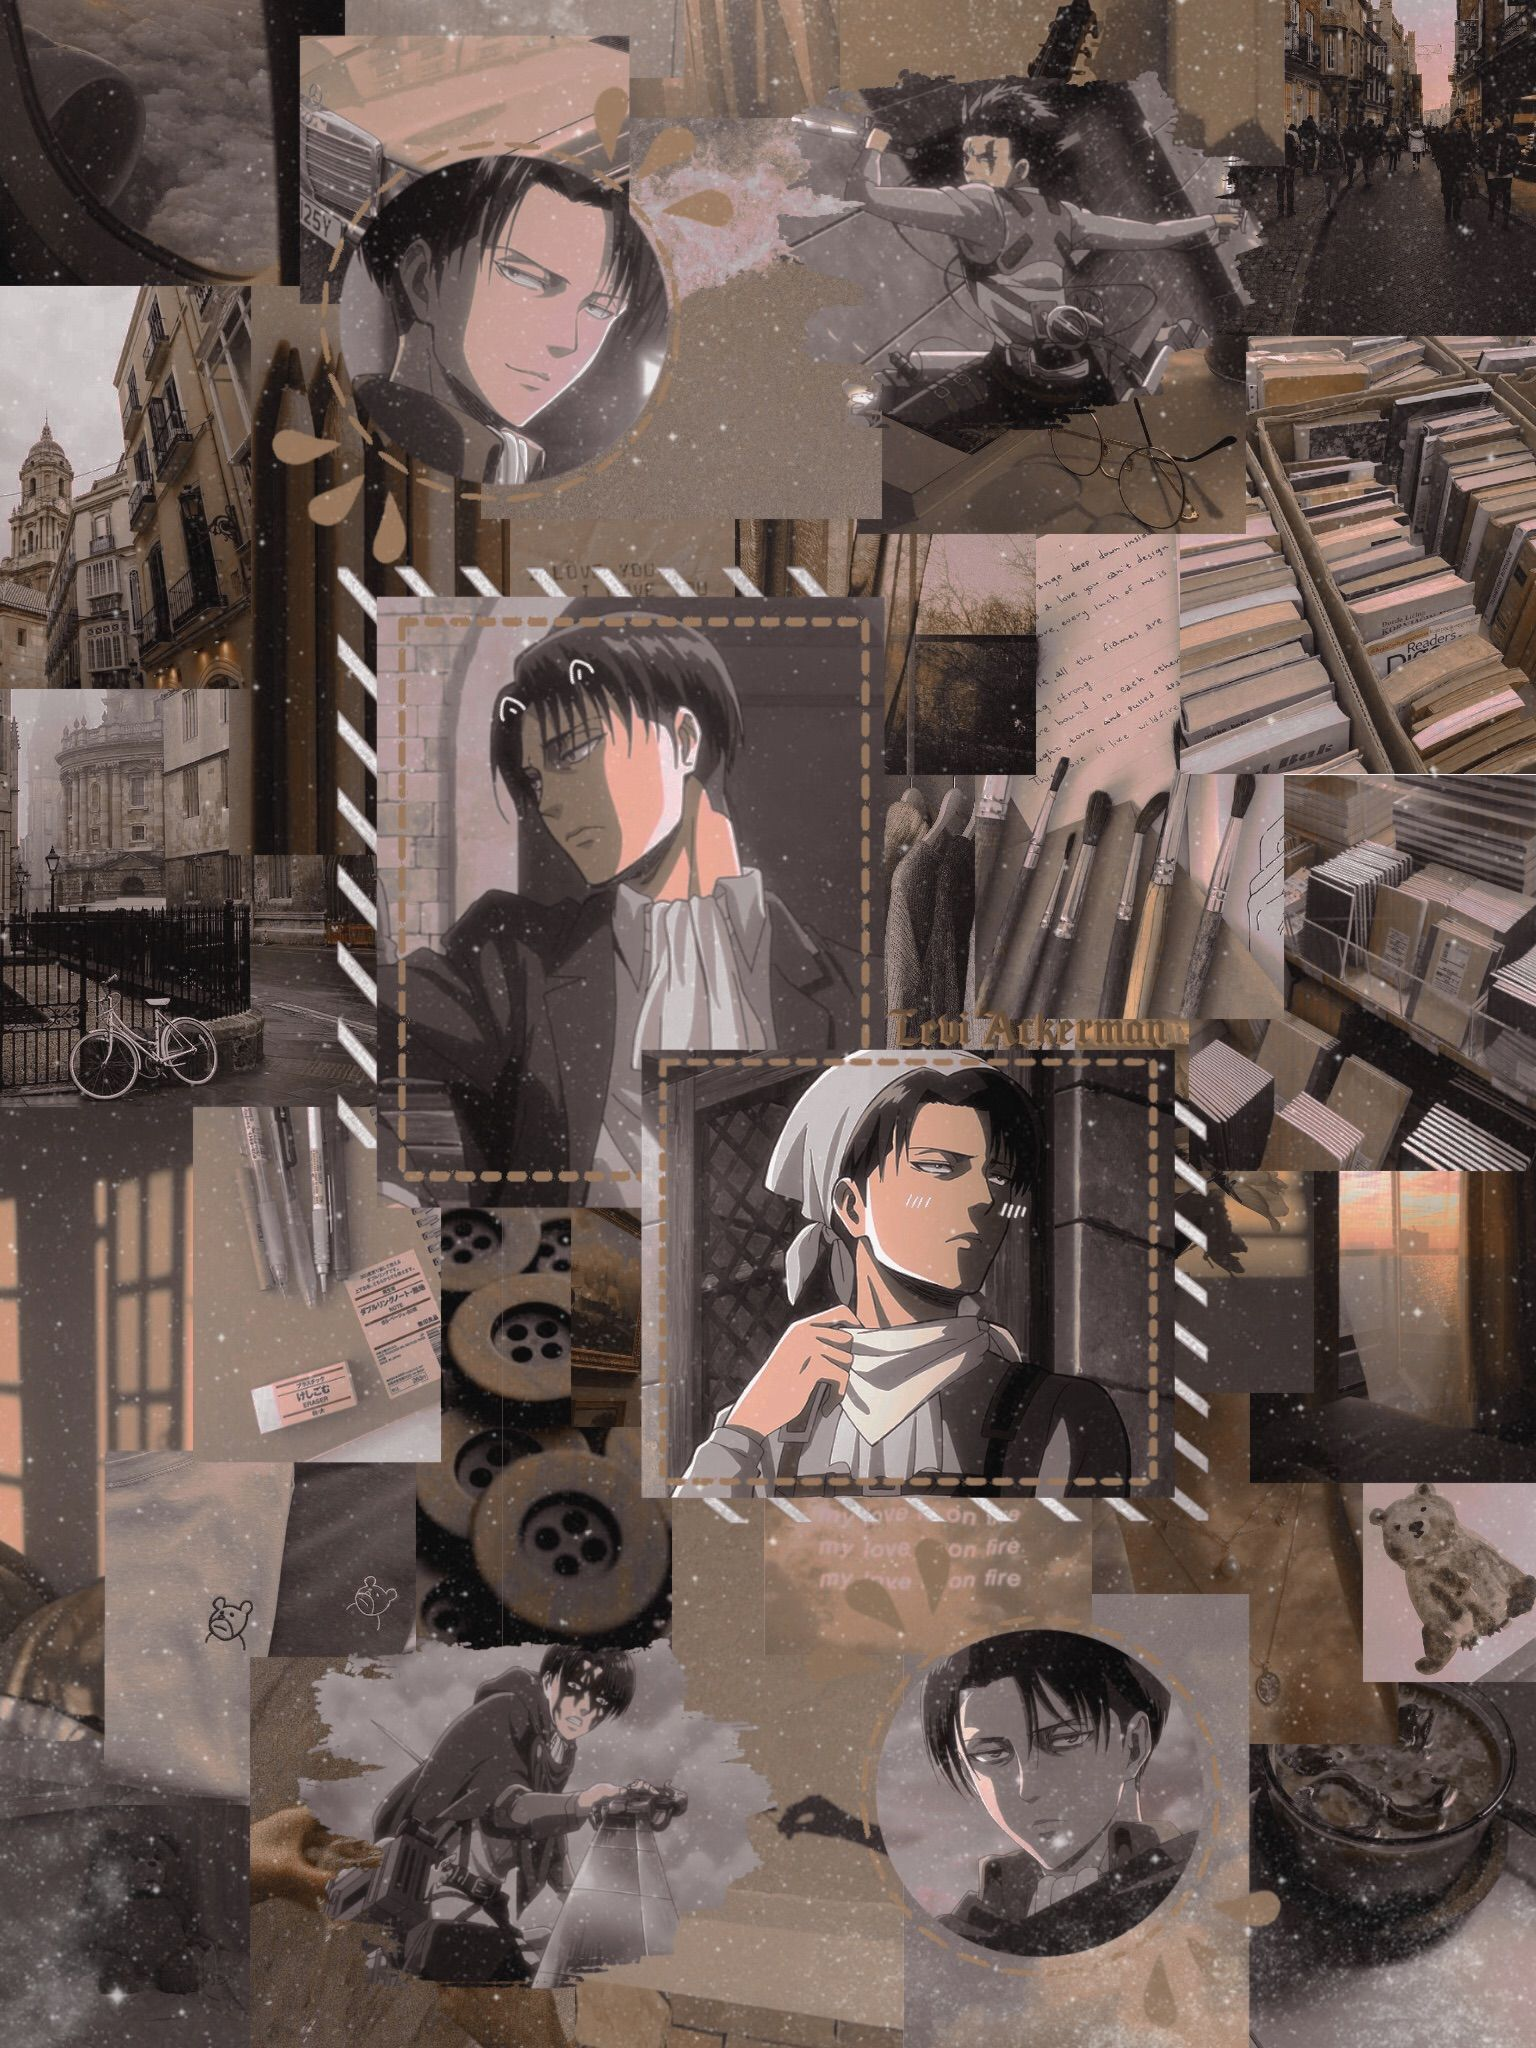 ɇ' Lunaaaa Exe Captain Levi Ackerman Aesthetic Phone Wallpaper Brown In 2020 Anime Wallpaper Cute Anime Wallpaper Aesthetic Anime